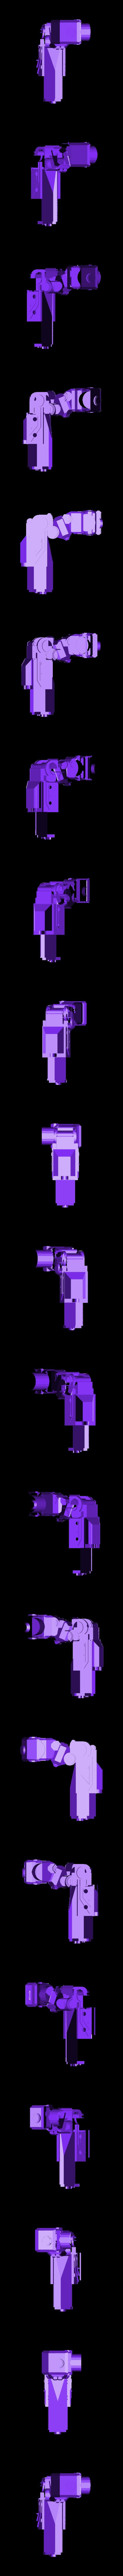 Linebacker_Left_Arm.stl Download free STL file MechWarrior Linebacker • 3D printable model, mrhers2